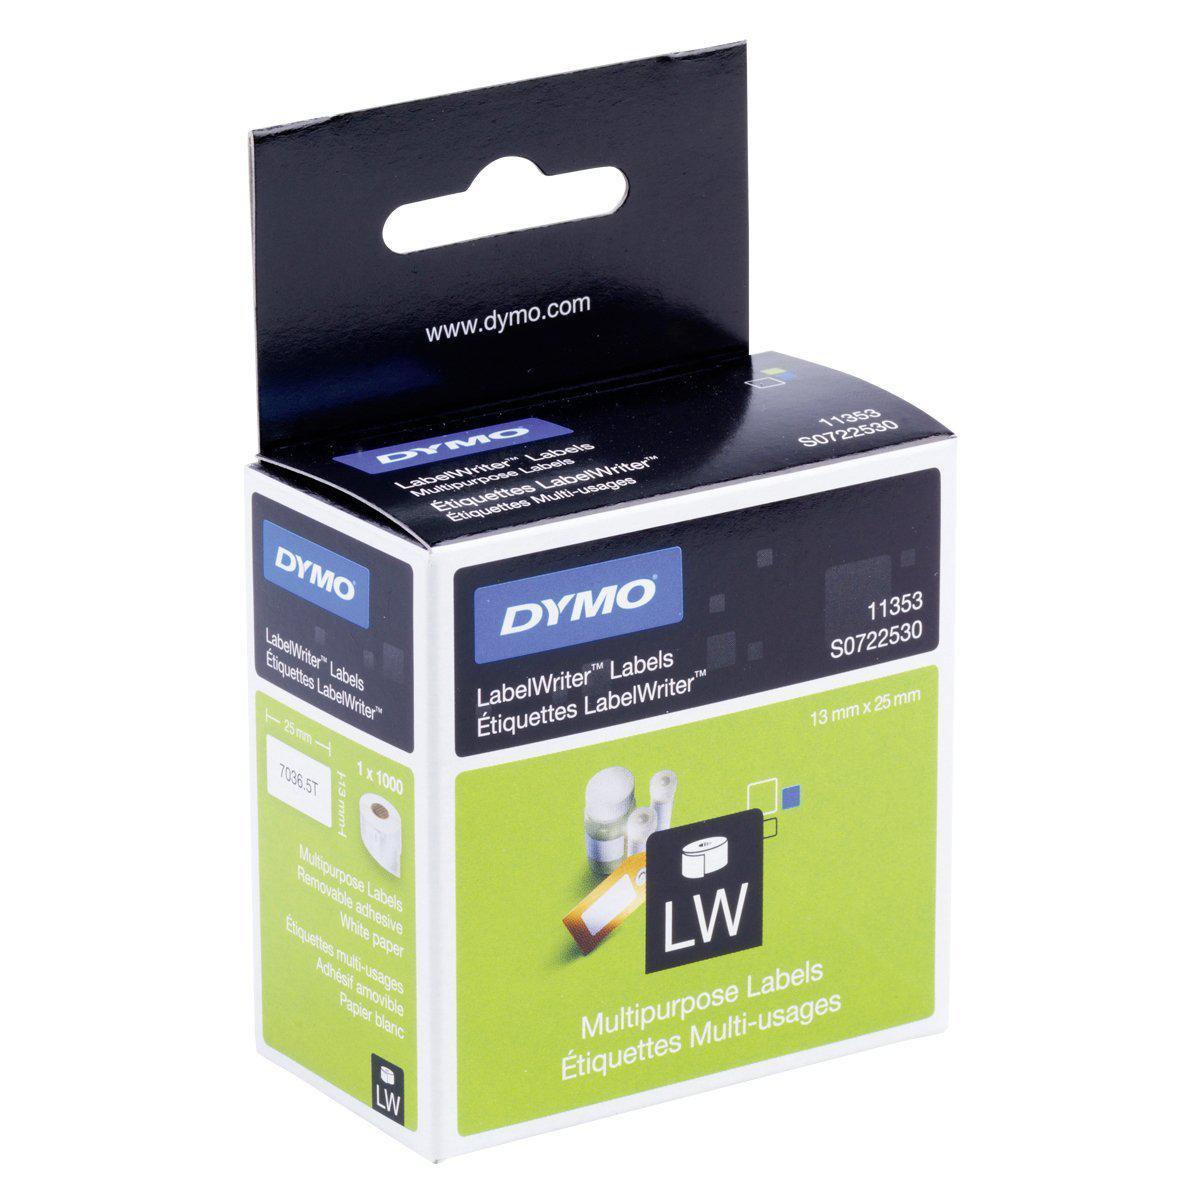 DYMO AllRound Etikett 12mm x 24mm